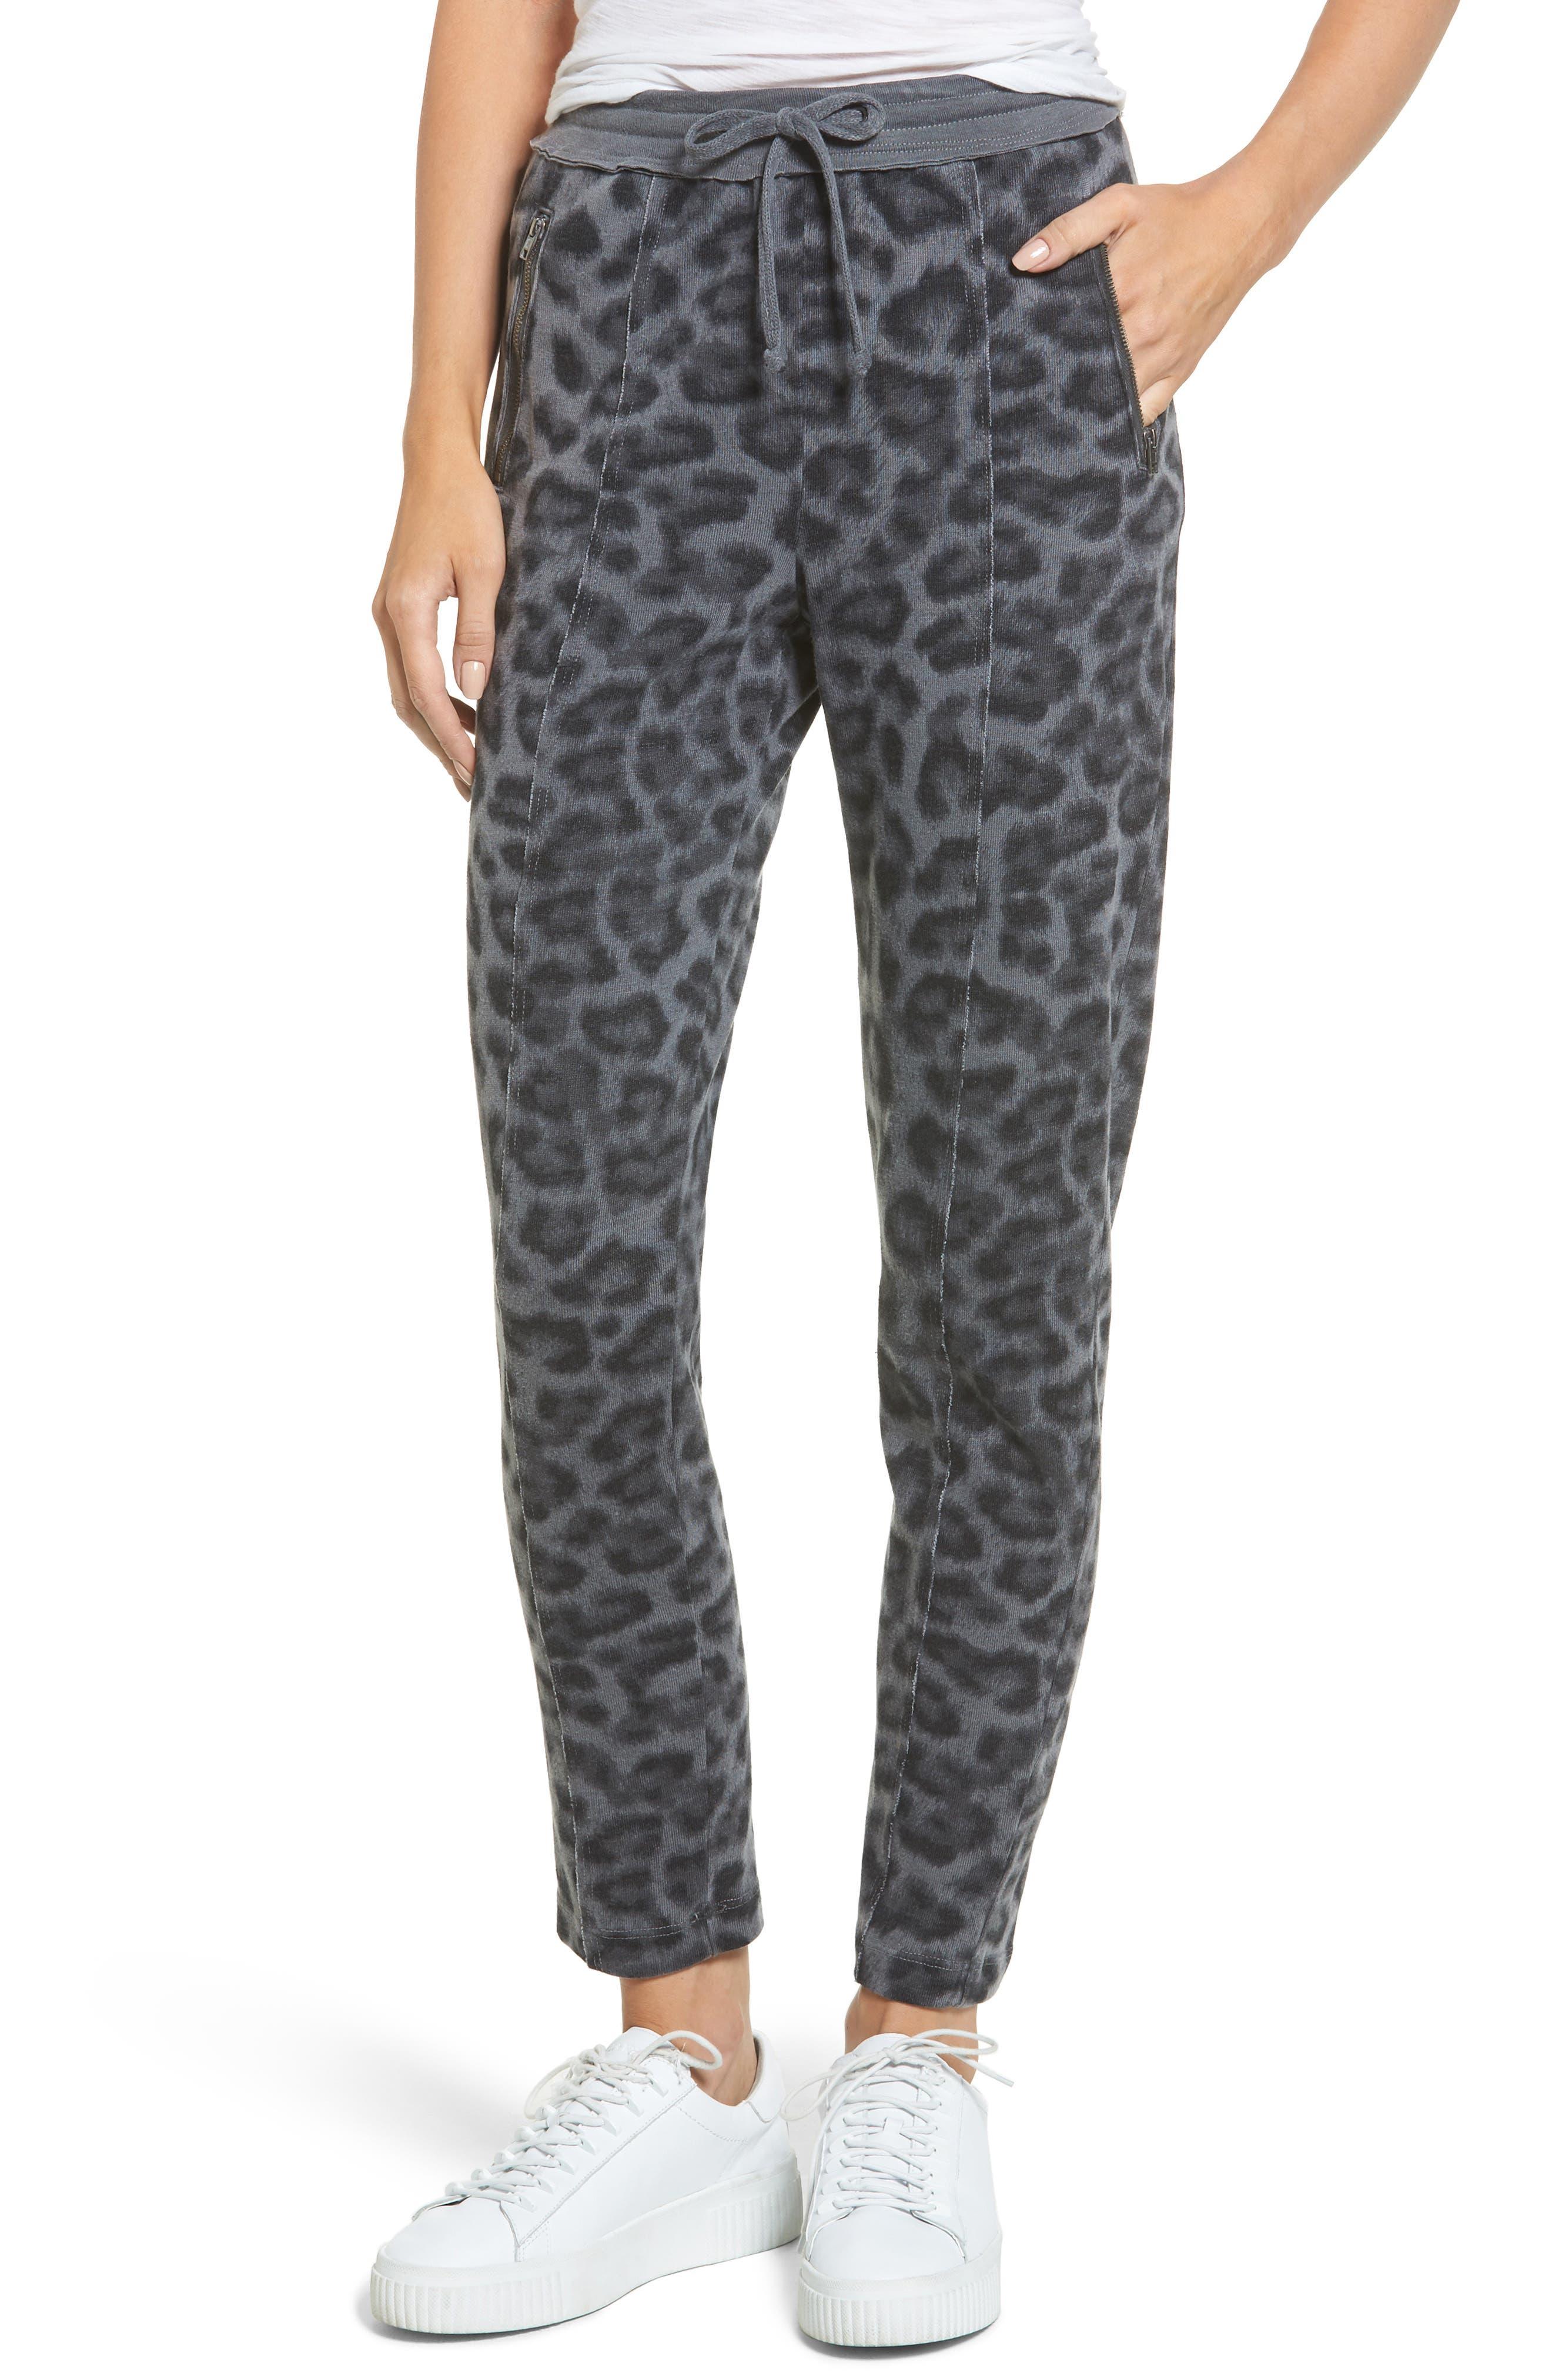 Splendid Leopard Print Jogger Pants